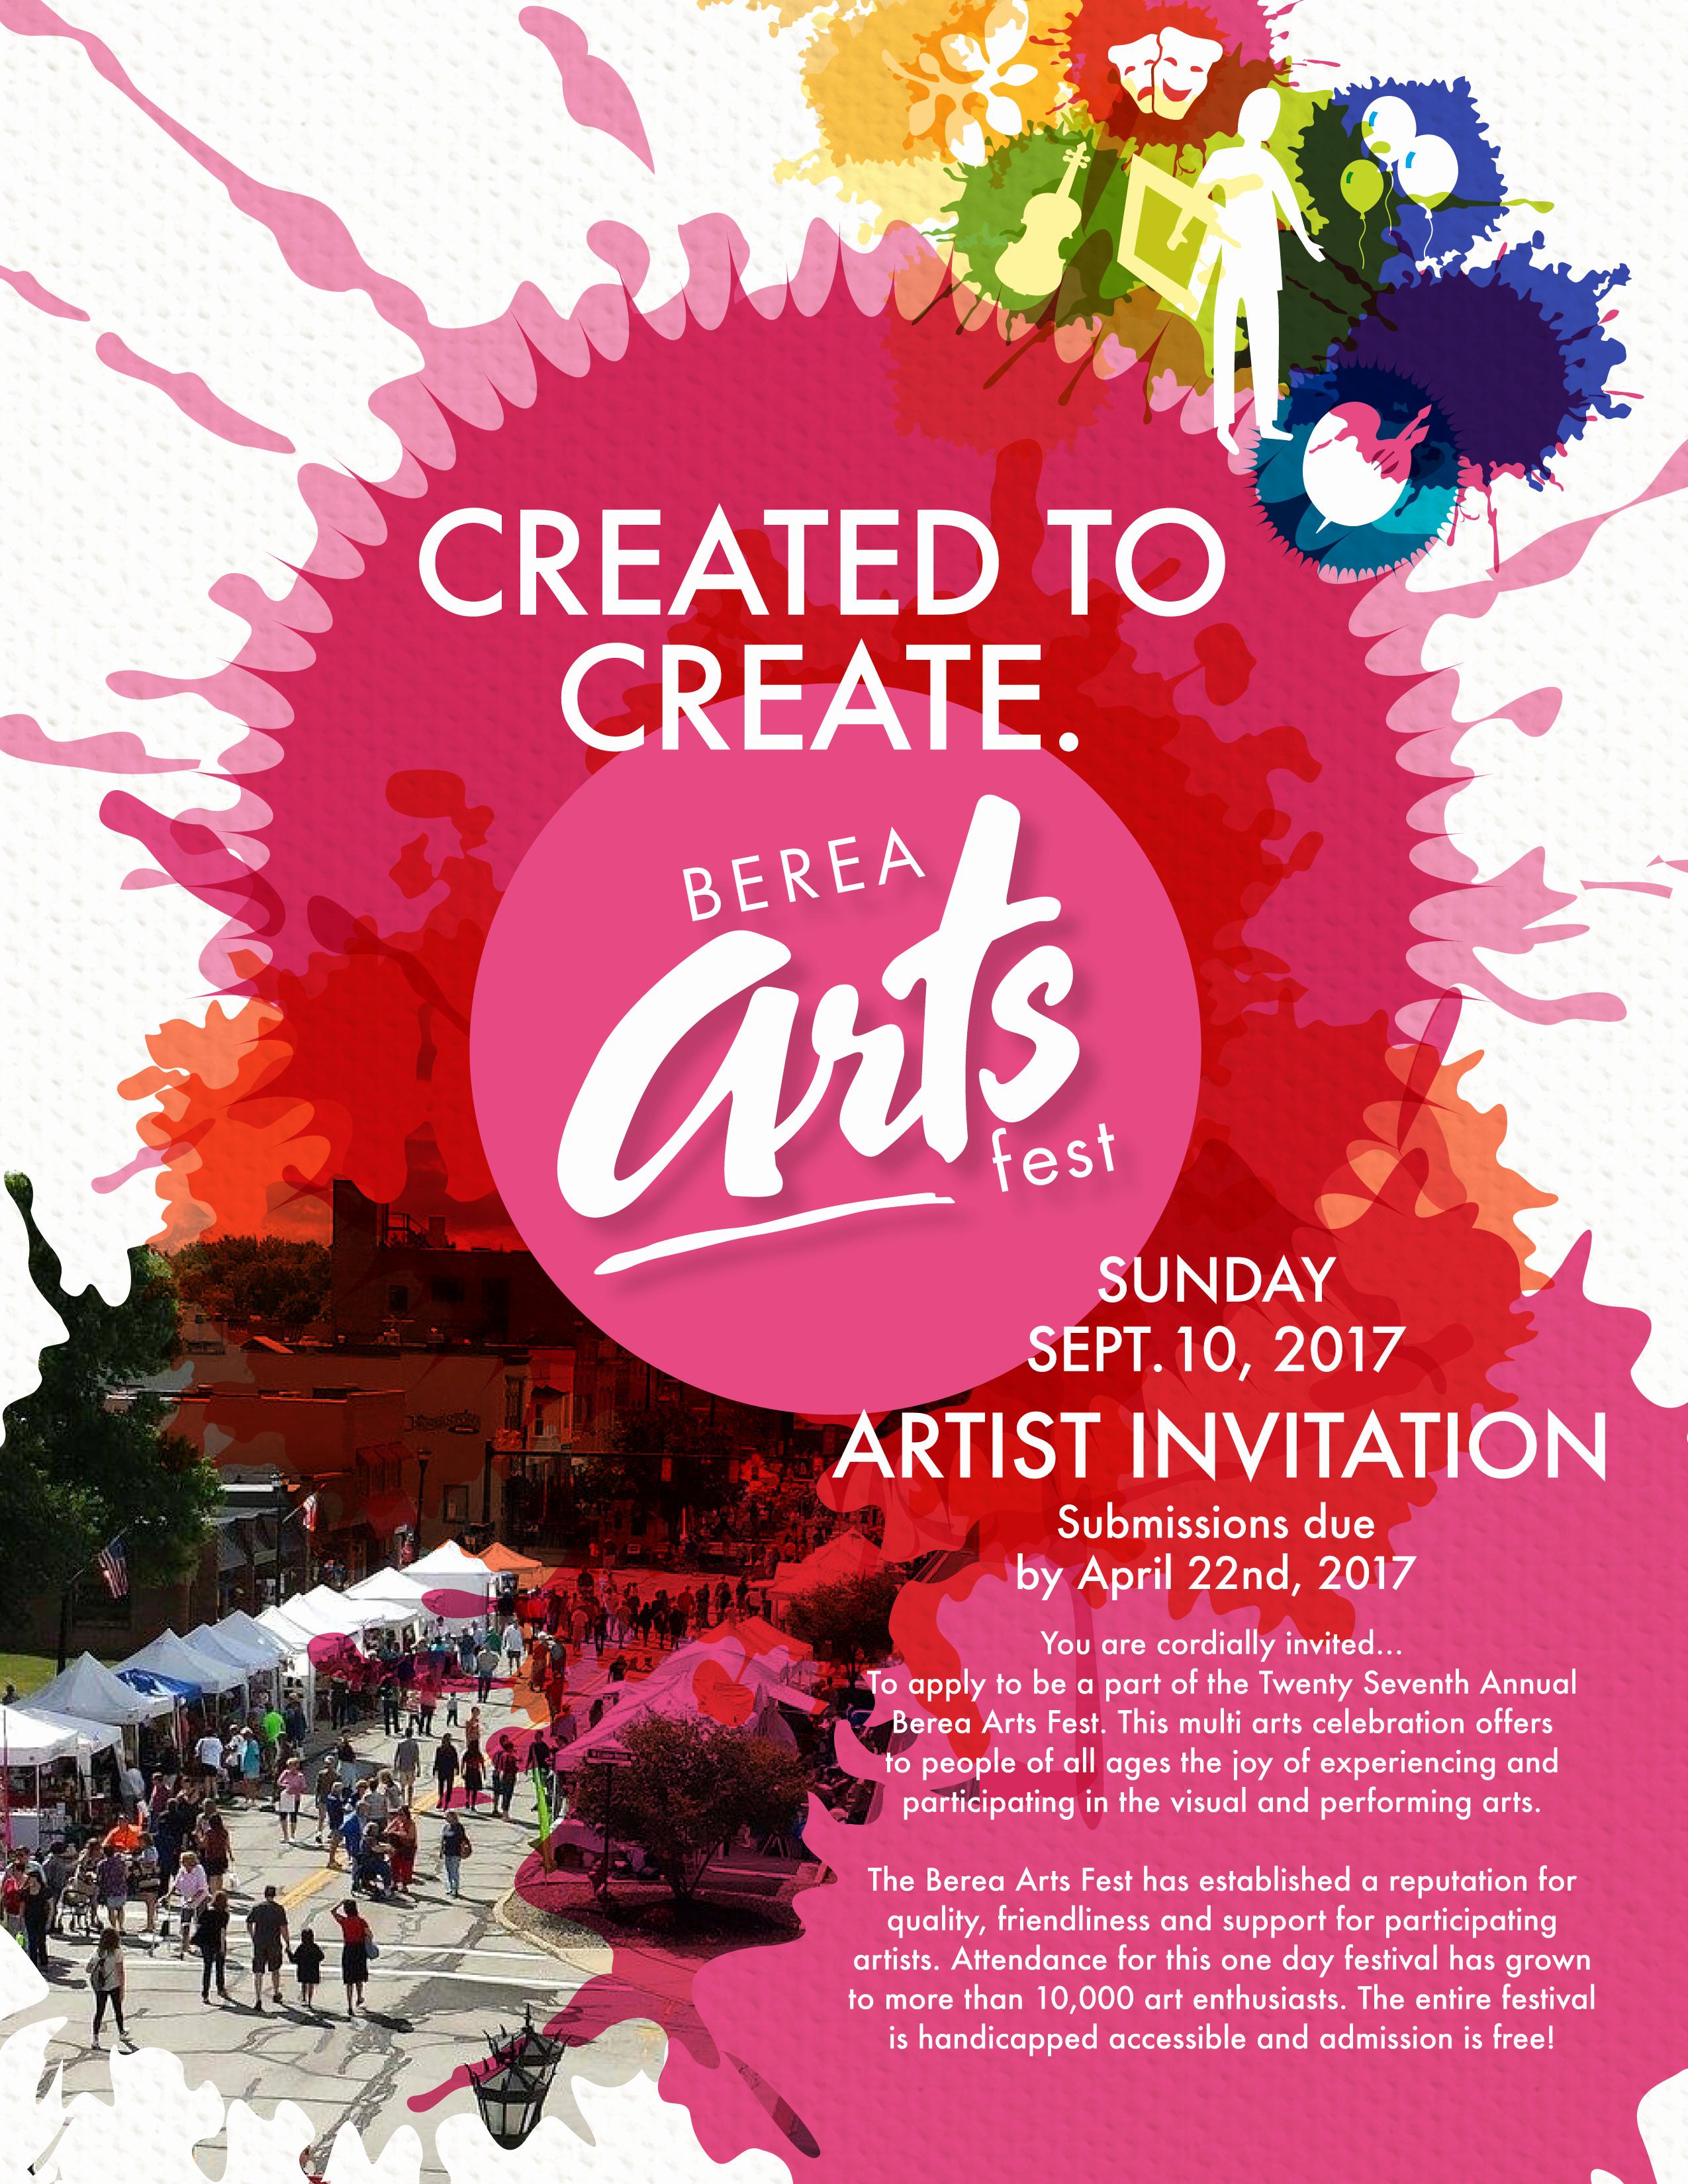 Art Show Invitation Wording Luxury General Info Berea Arts Fest